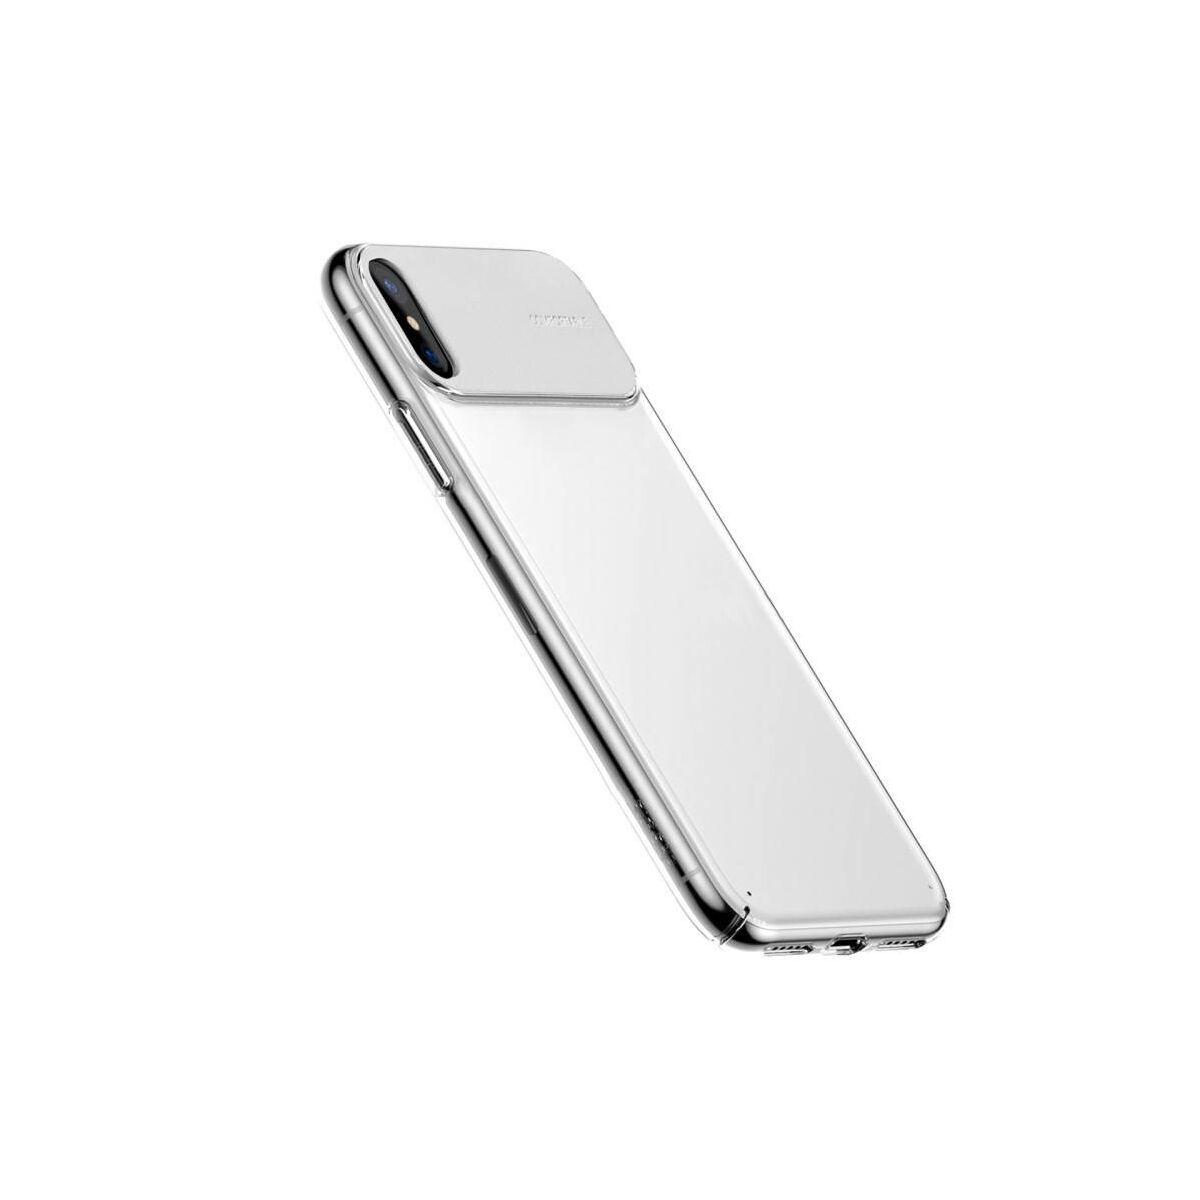 Baseus iPhone XS tok, Comfortable, fehér (WIAPIPH58-SS02)